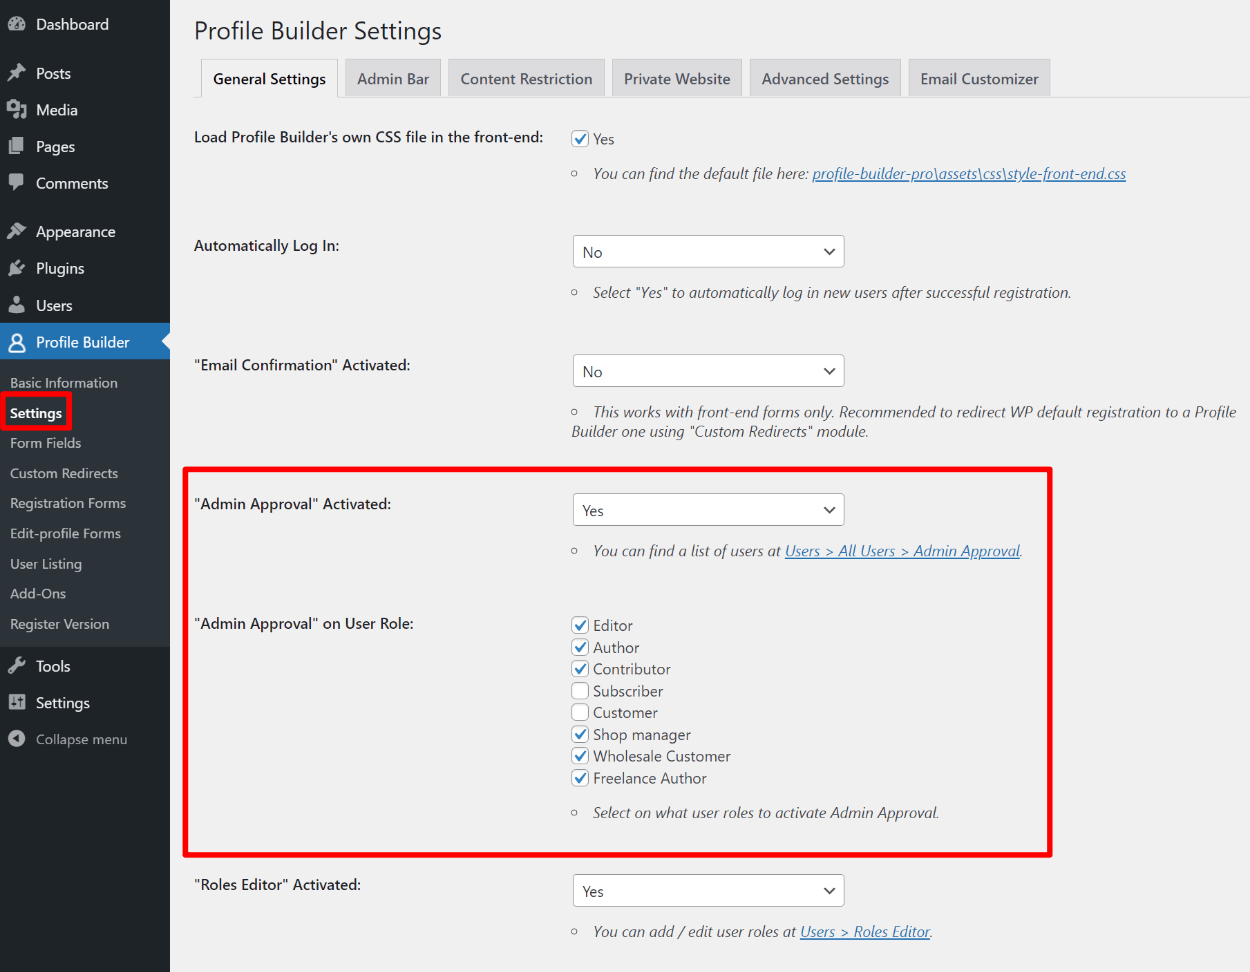 Choosing user roles on edit profile